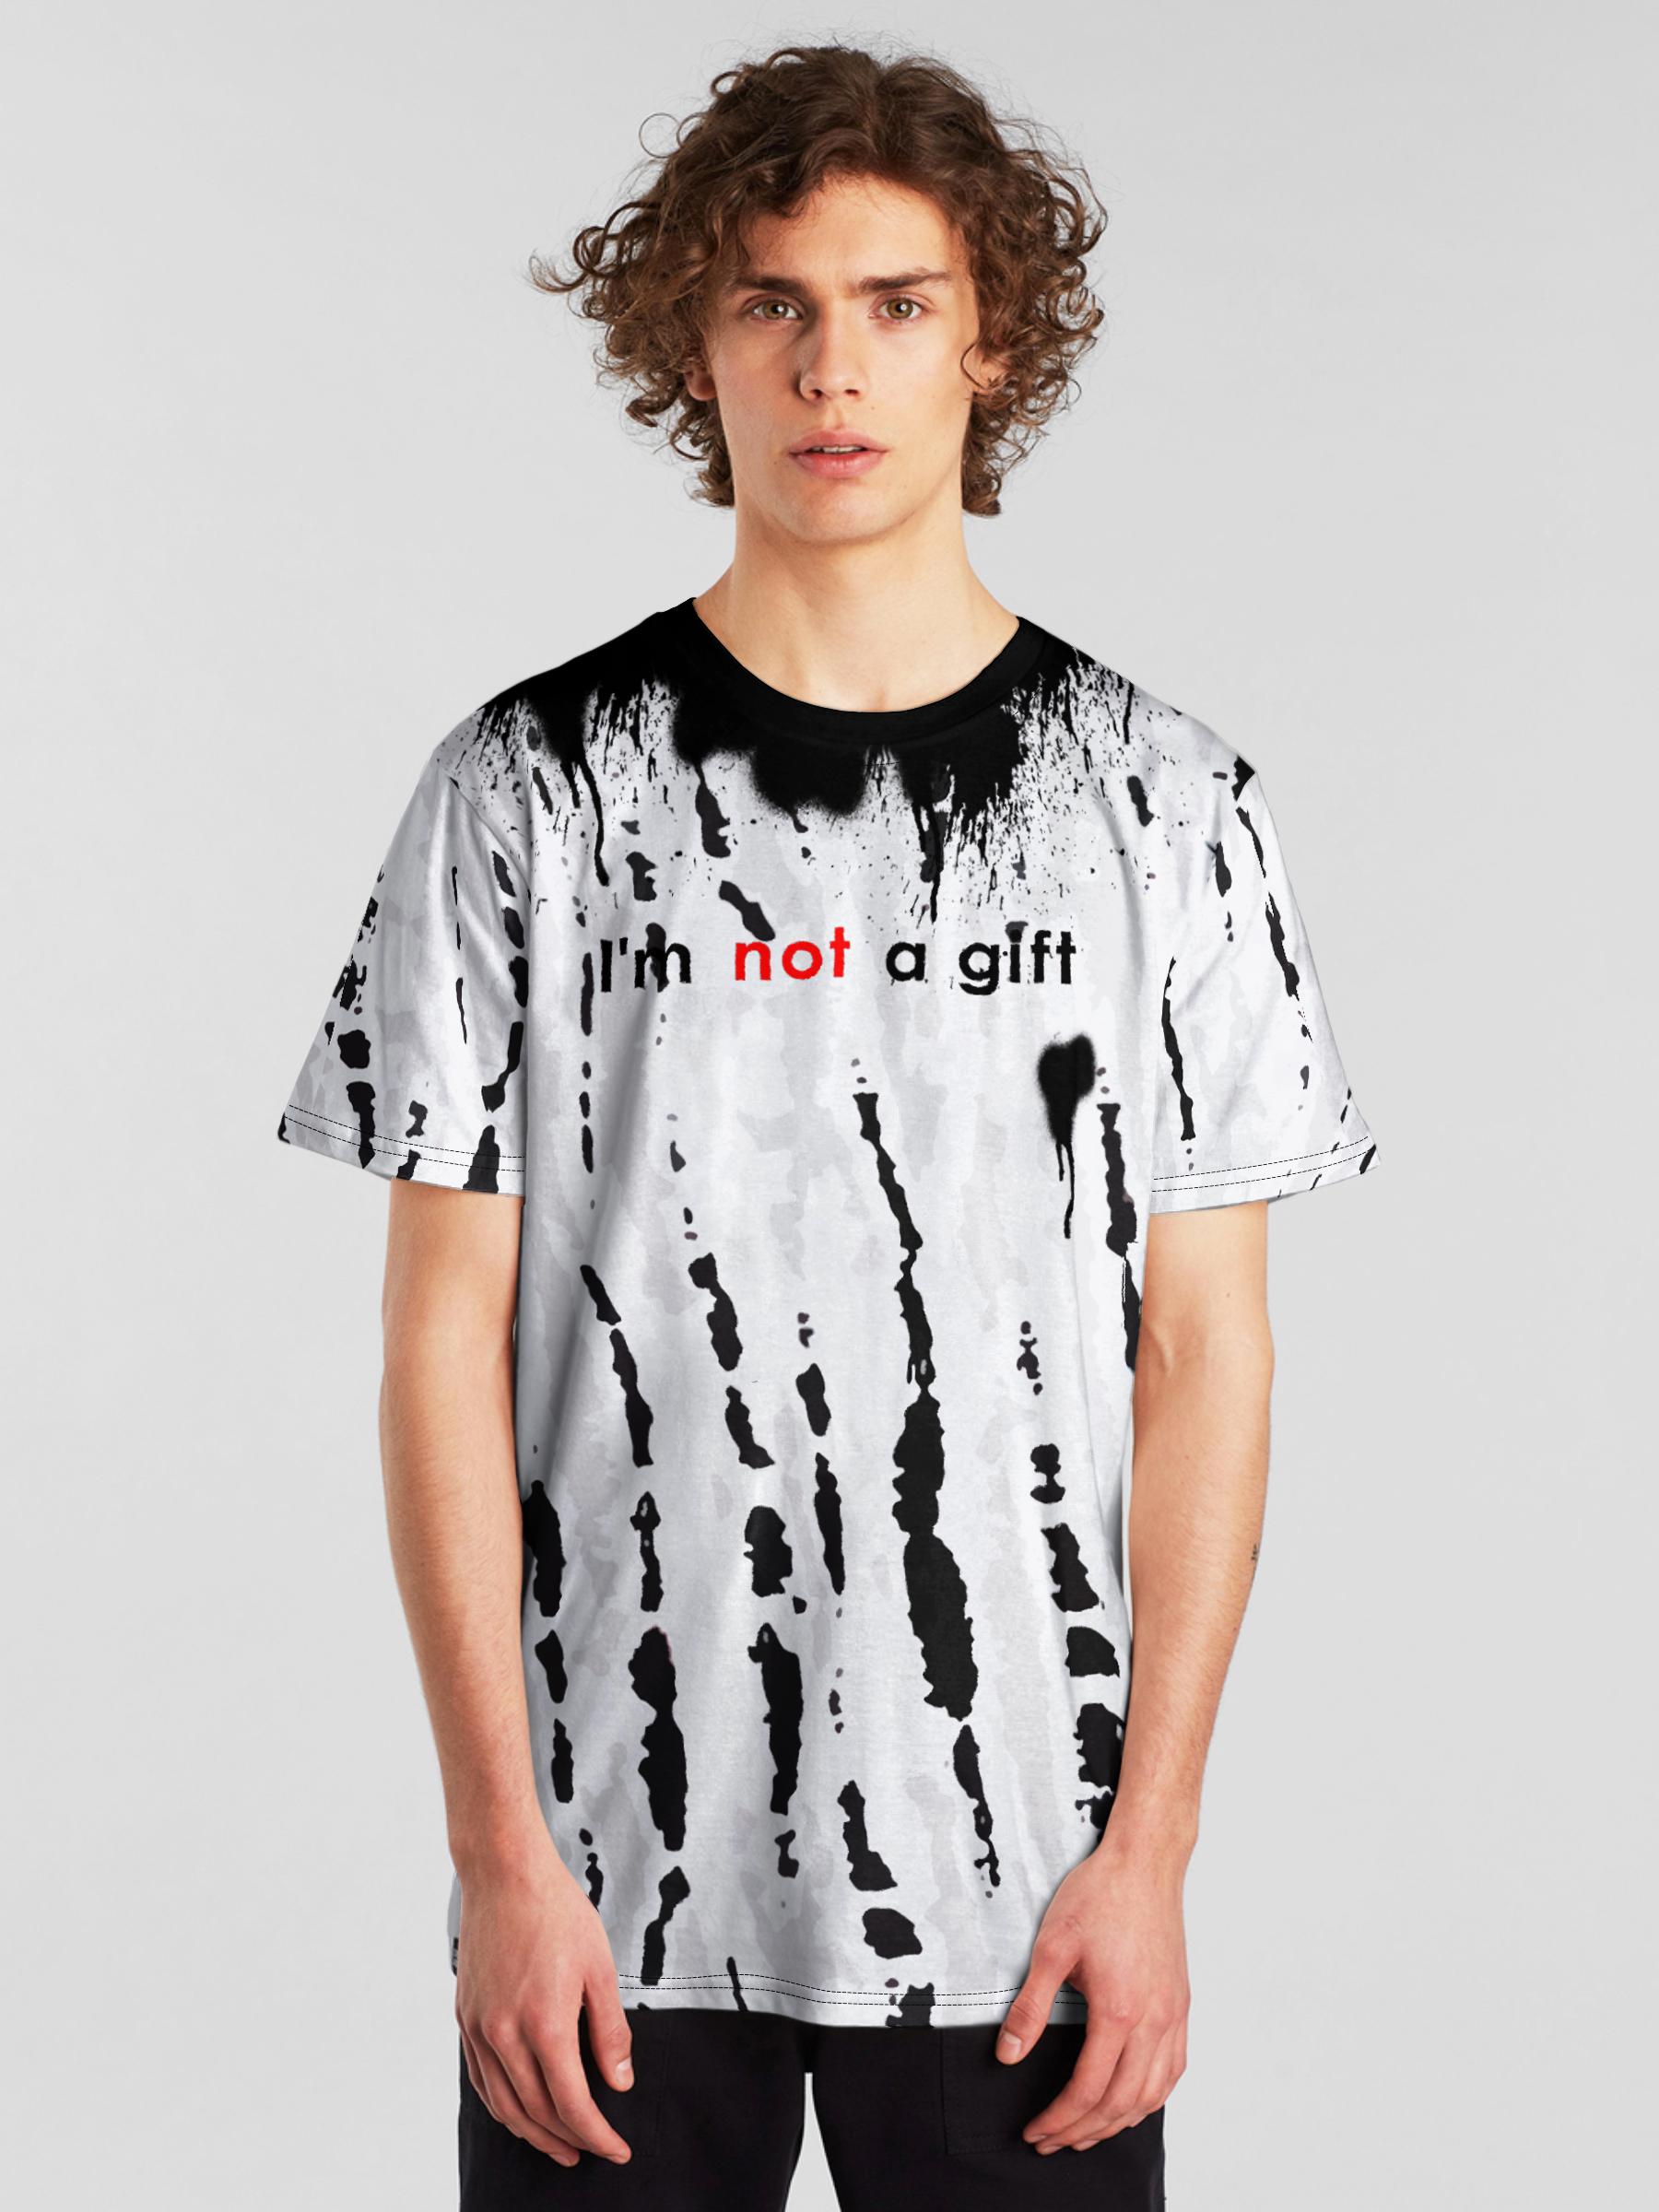 D4377 Платье VISAVIS женское  Peach 1